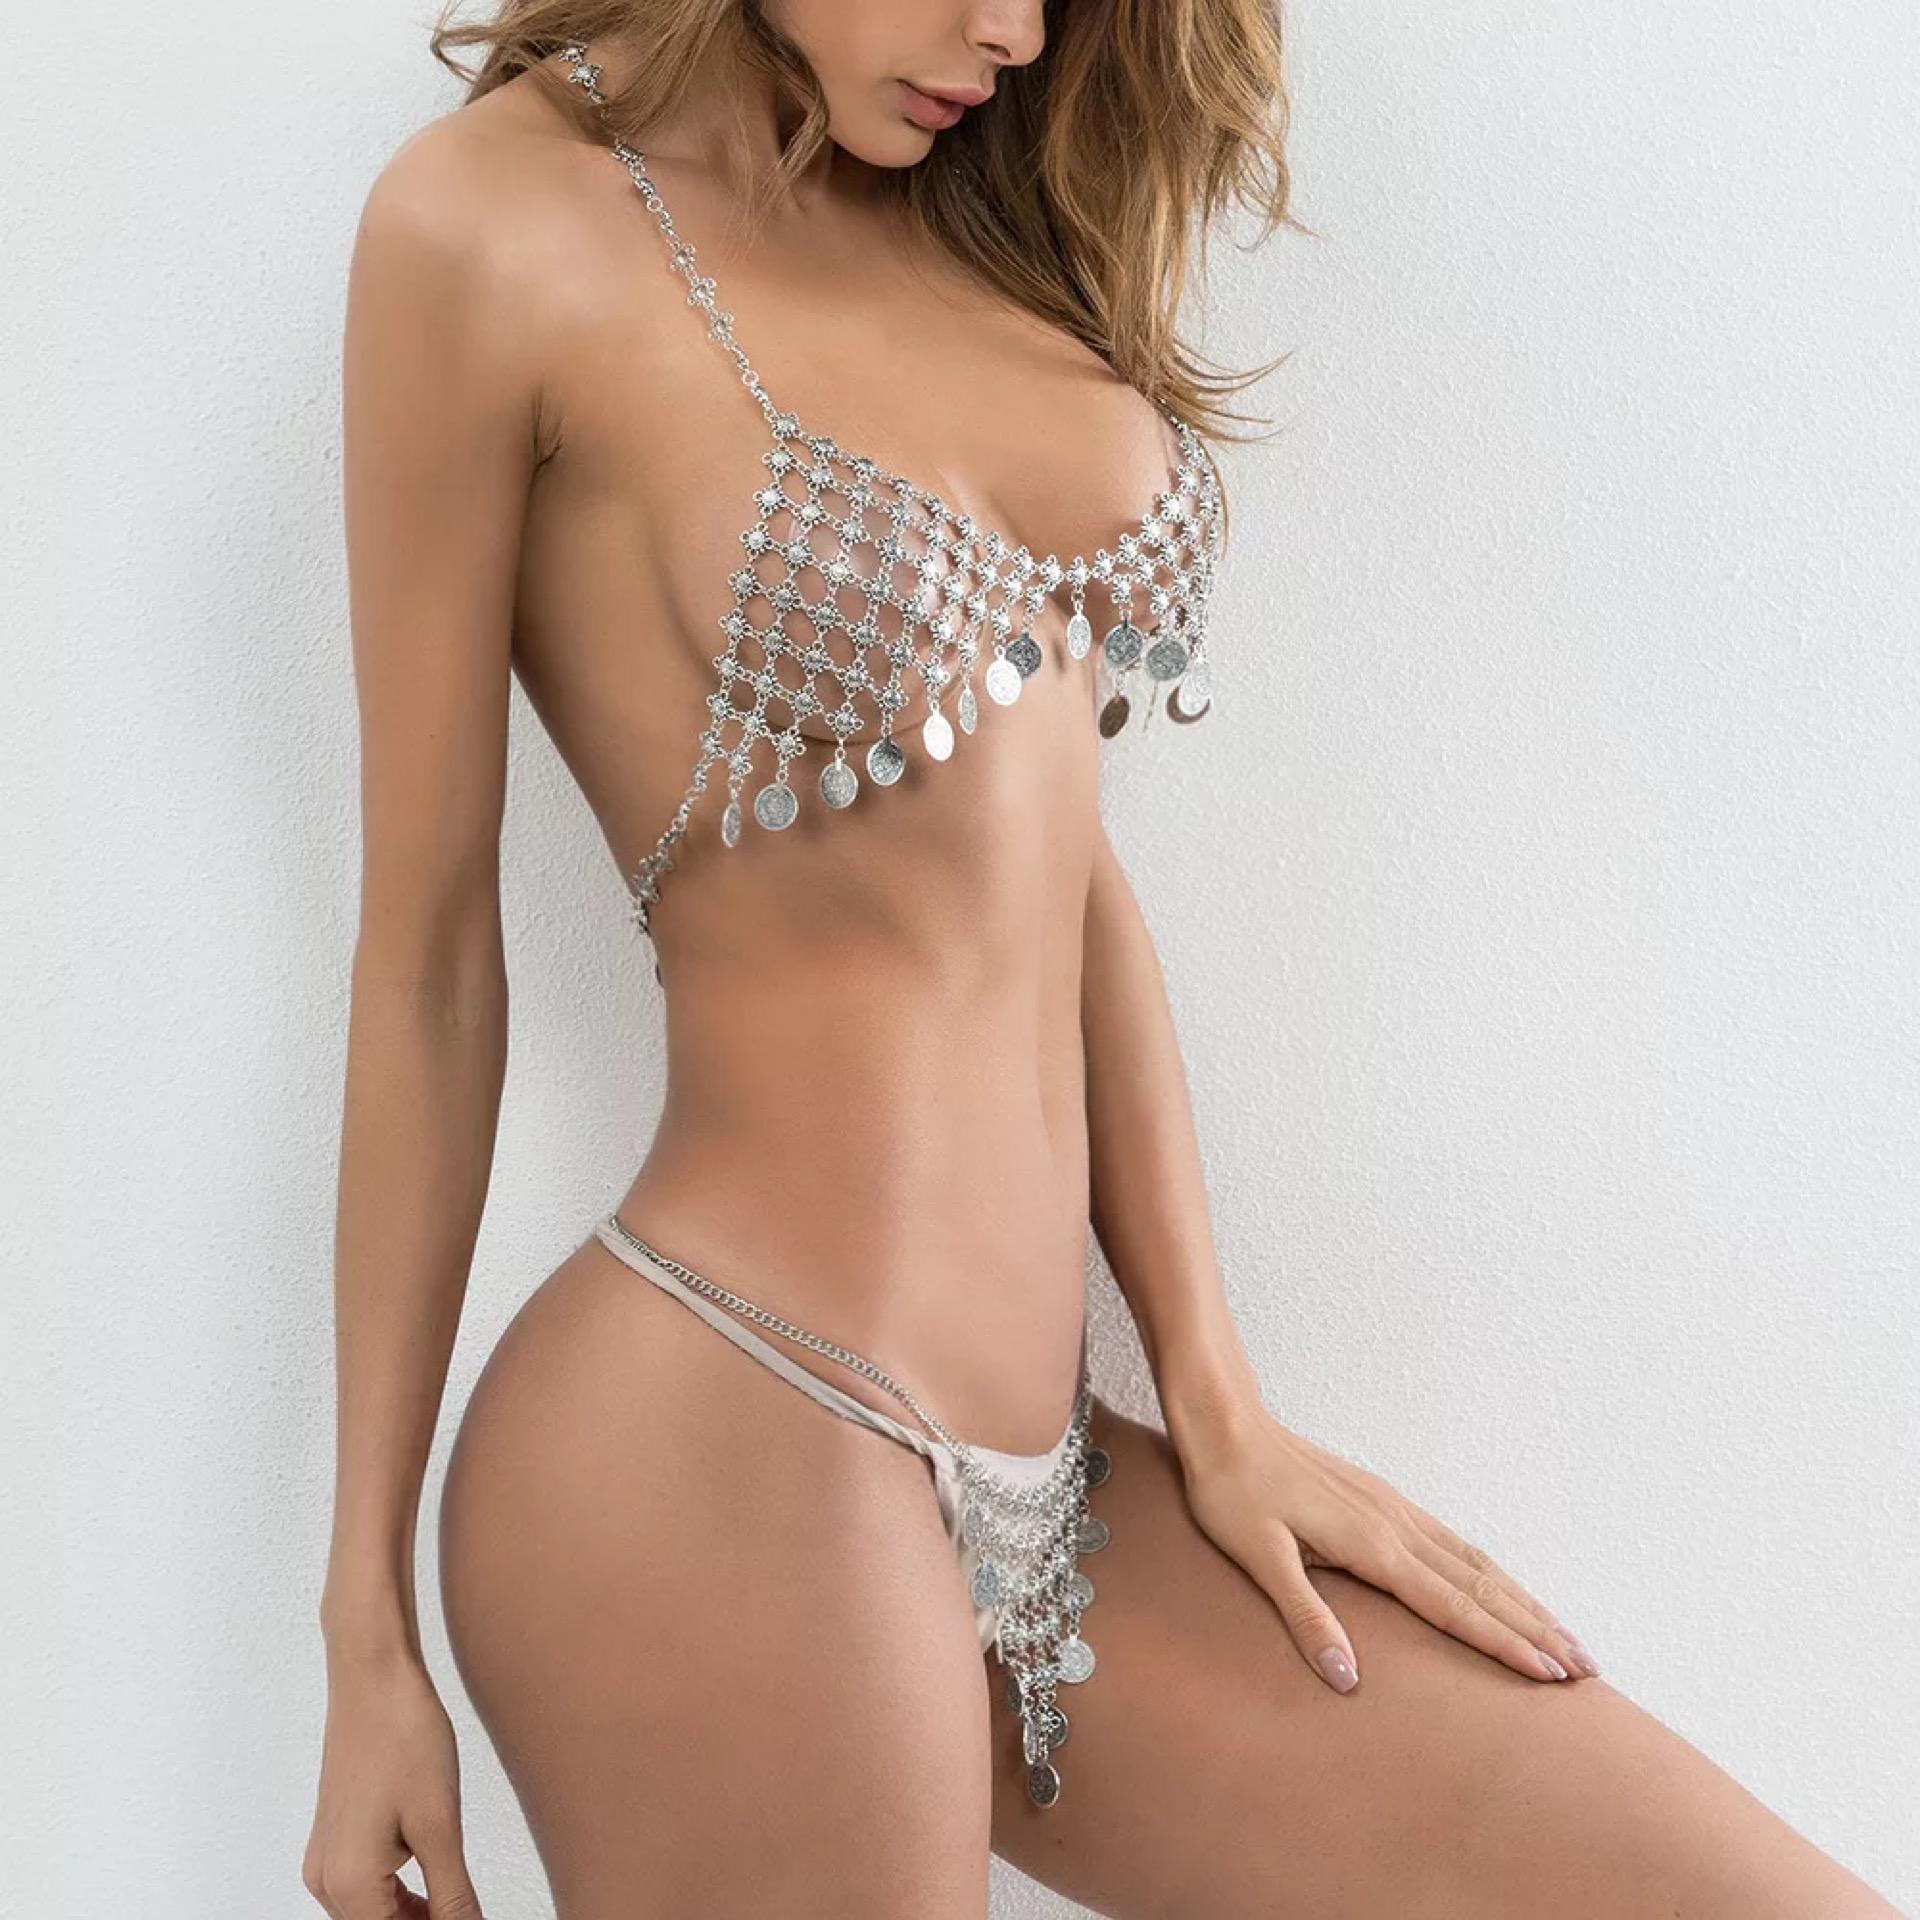 Busty mesh bikini, hot sexy amateur moms